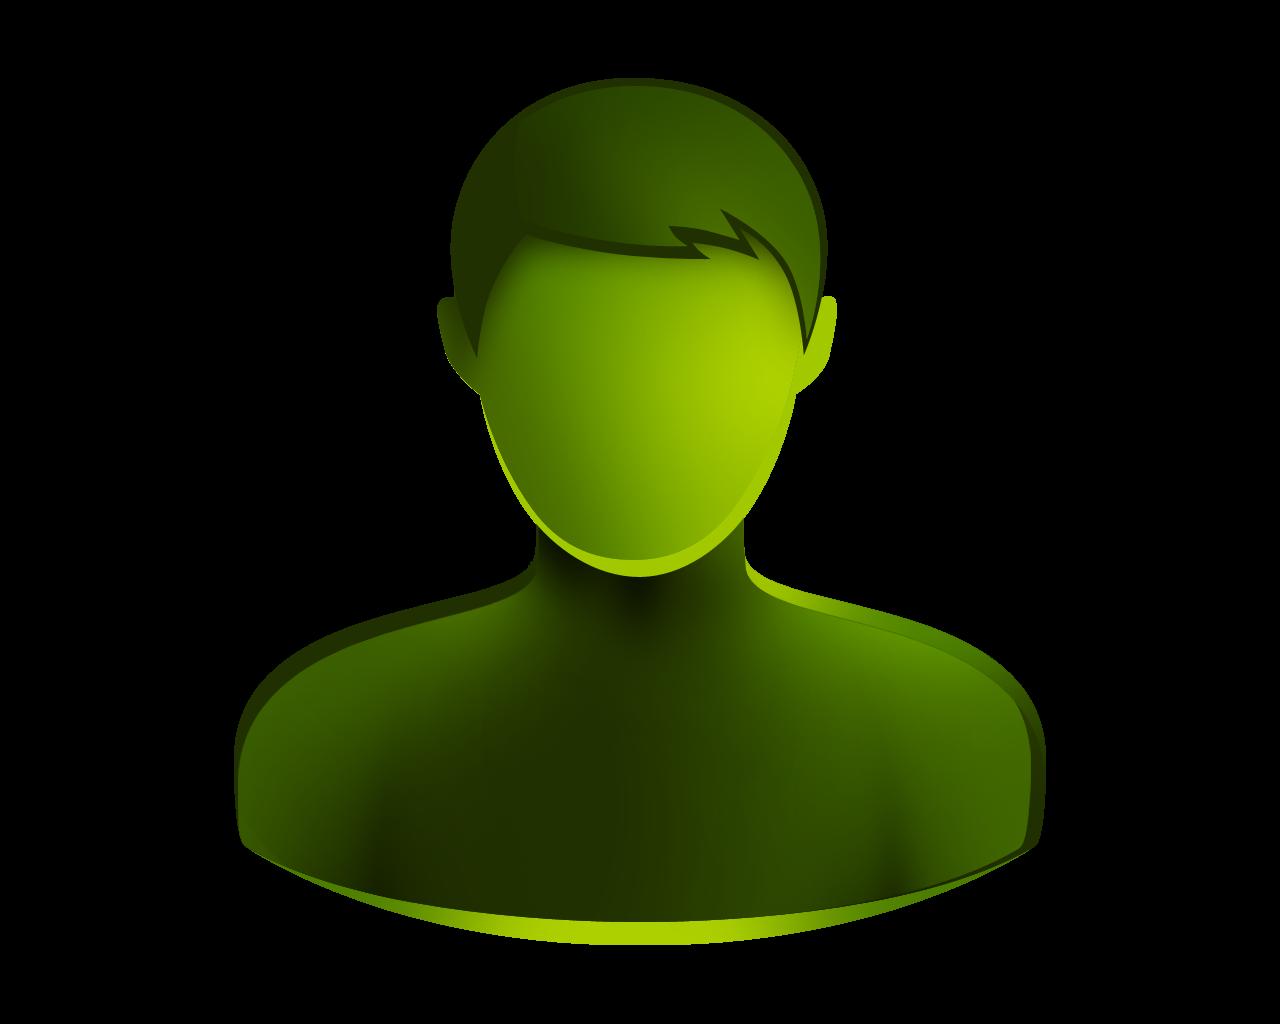 user_green